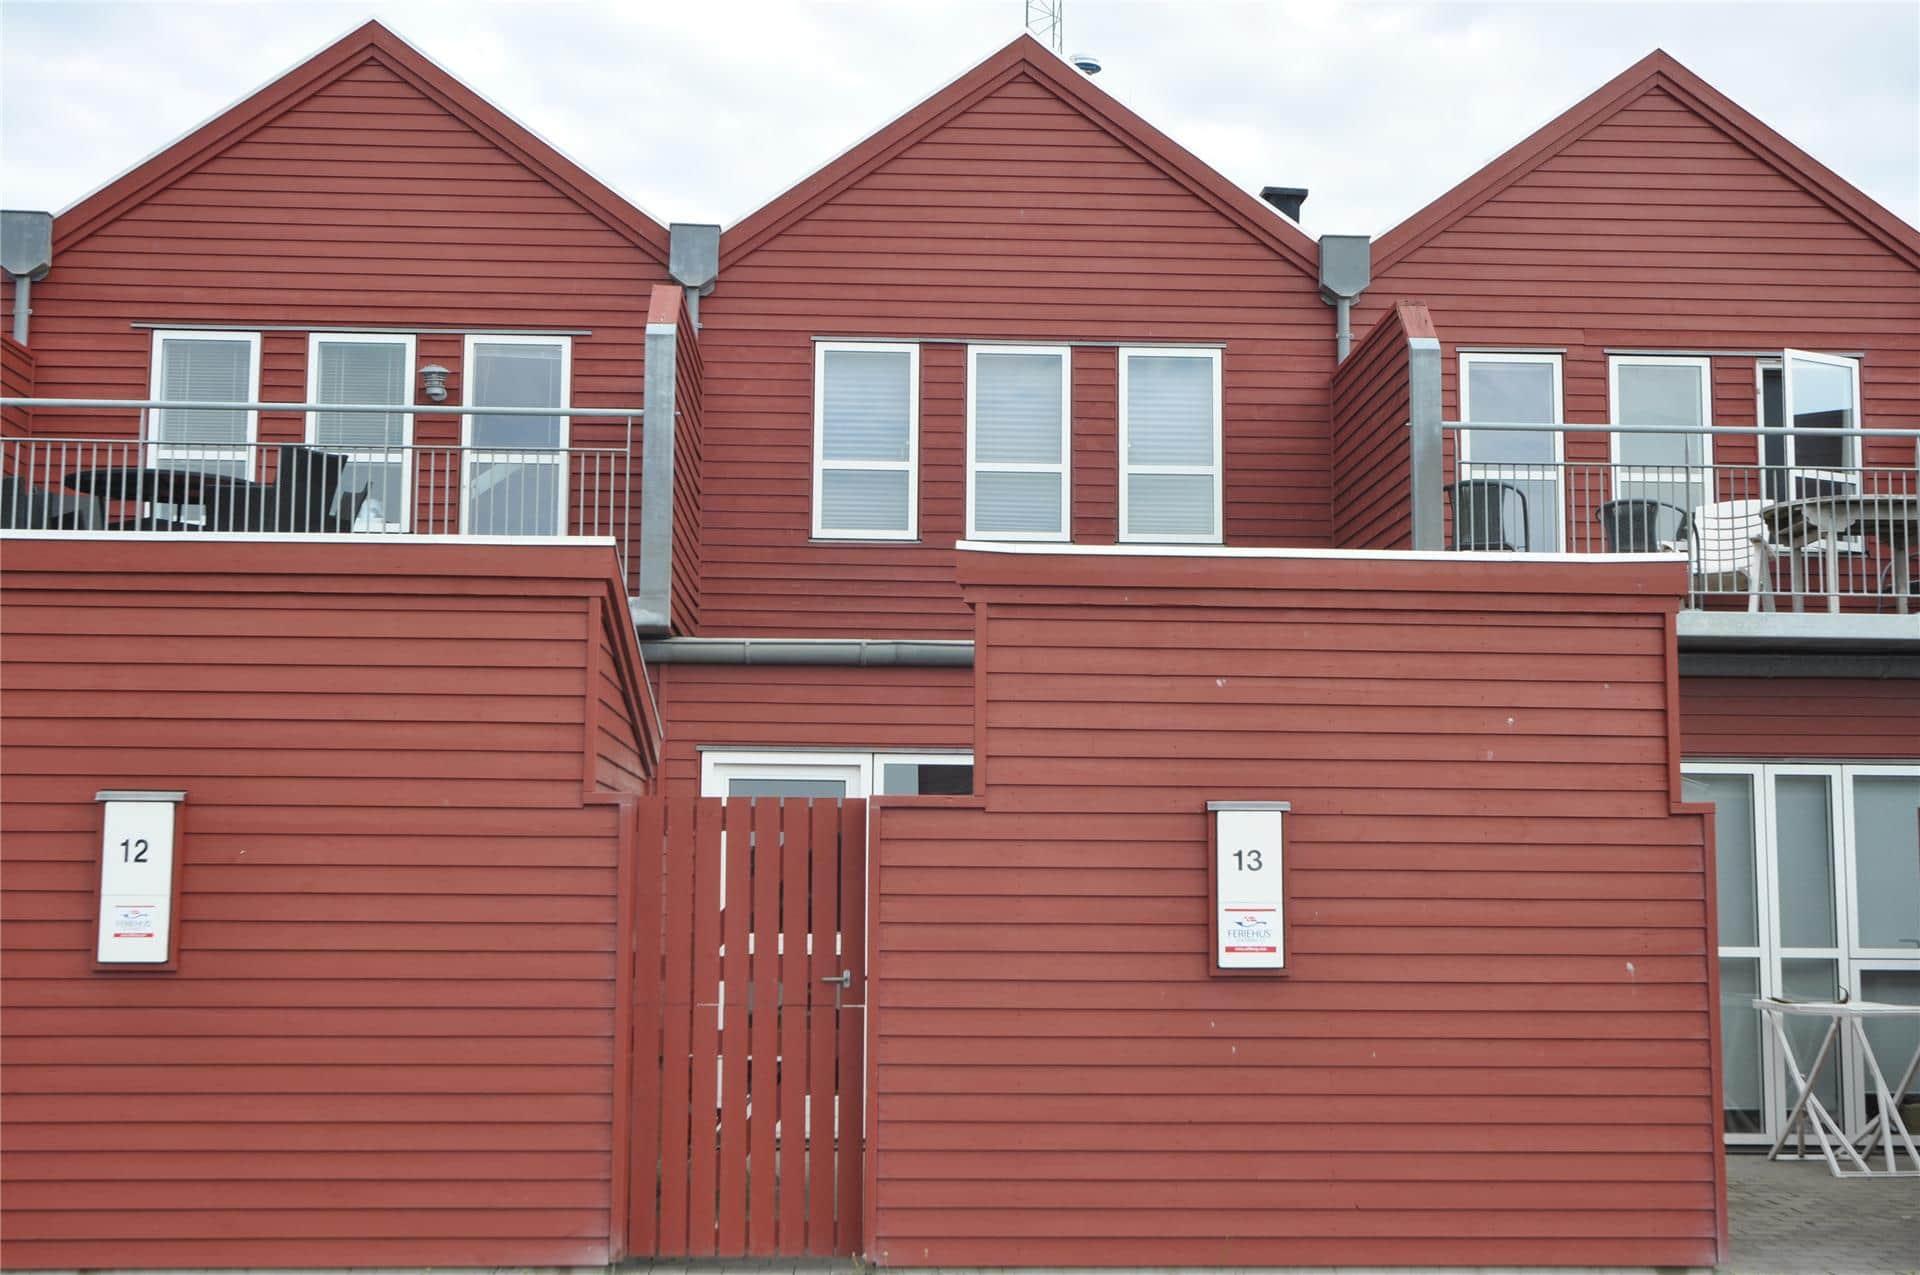 Billede 1-175 Sommerhus 70851, Havnevej 12, DK - 6990 Ulfborg